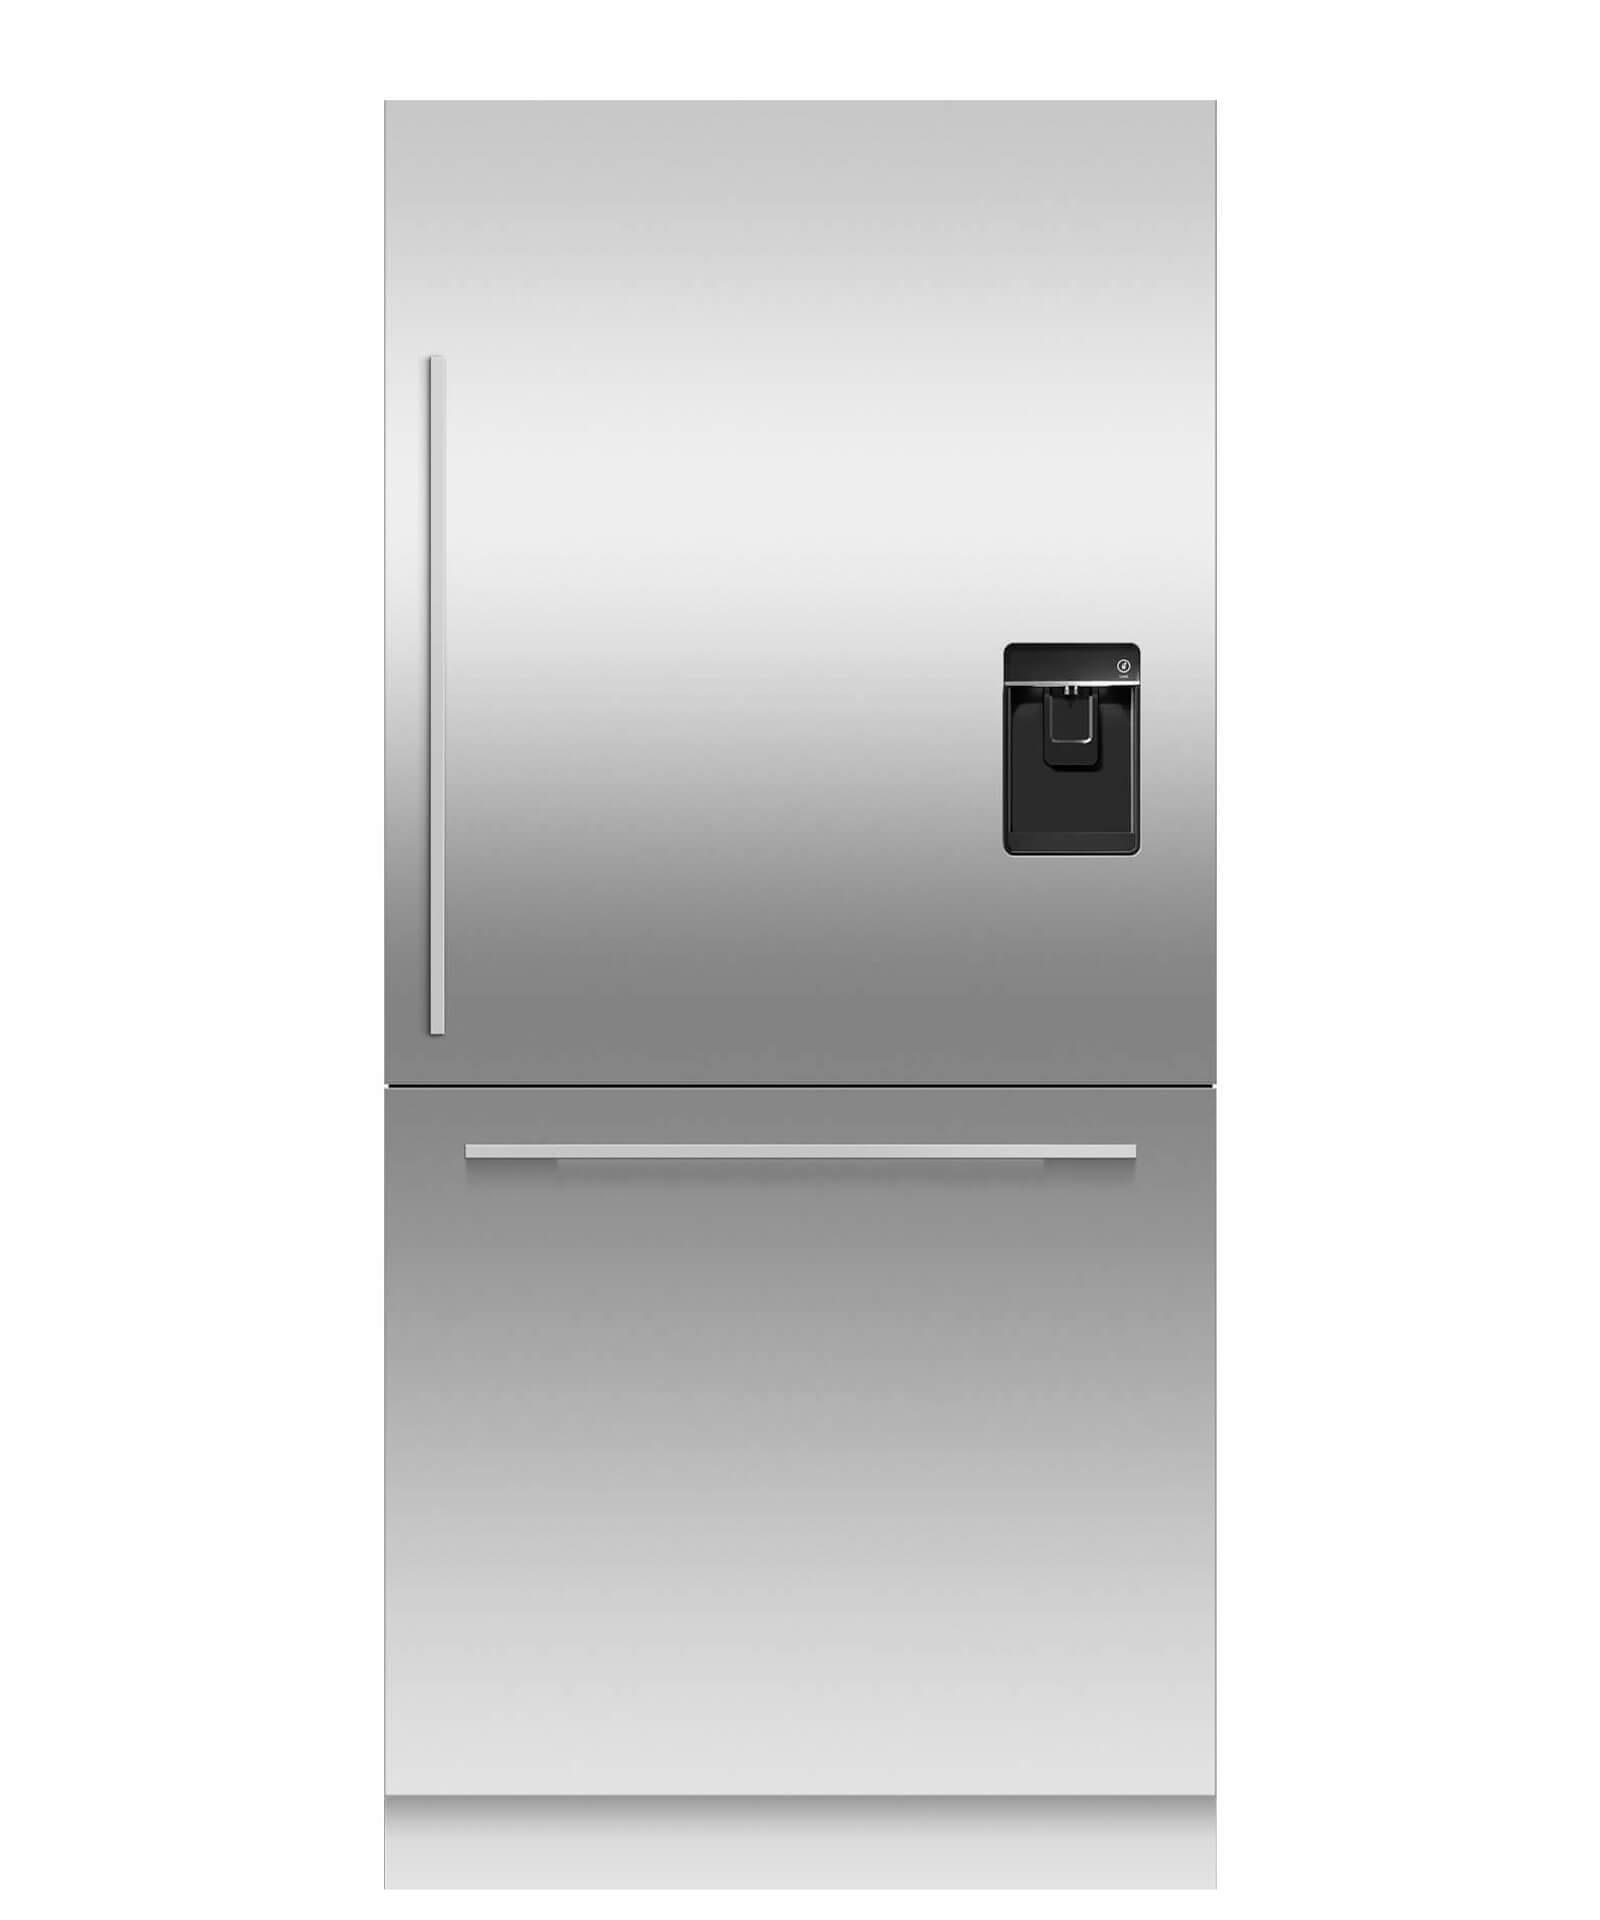 "Integrated Refrigerator Freezer, 36"", 16.8cu ft, Panel Ready, Ice & Water"